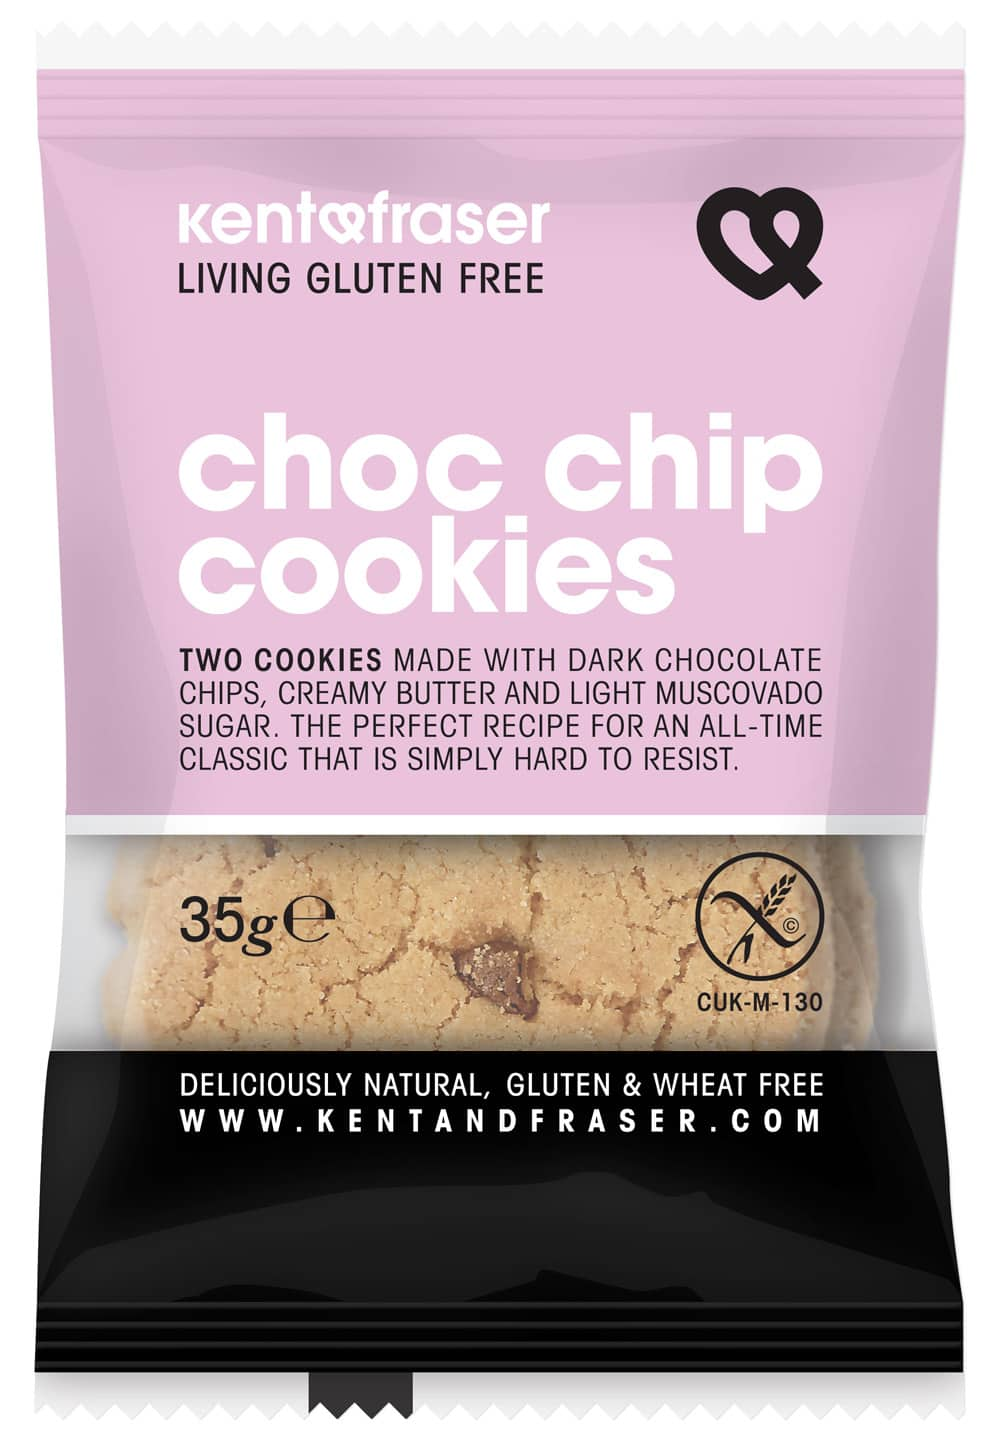 Kent & Fraser Gluten Free Cookies